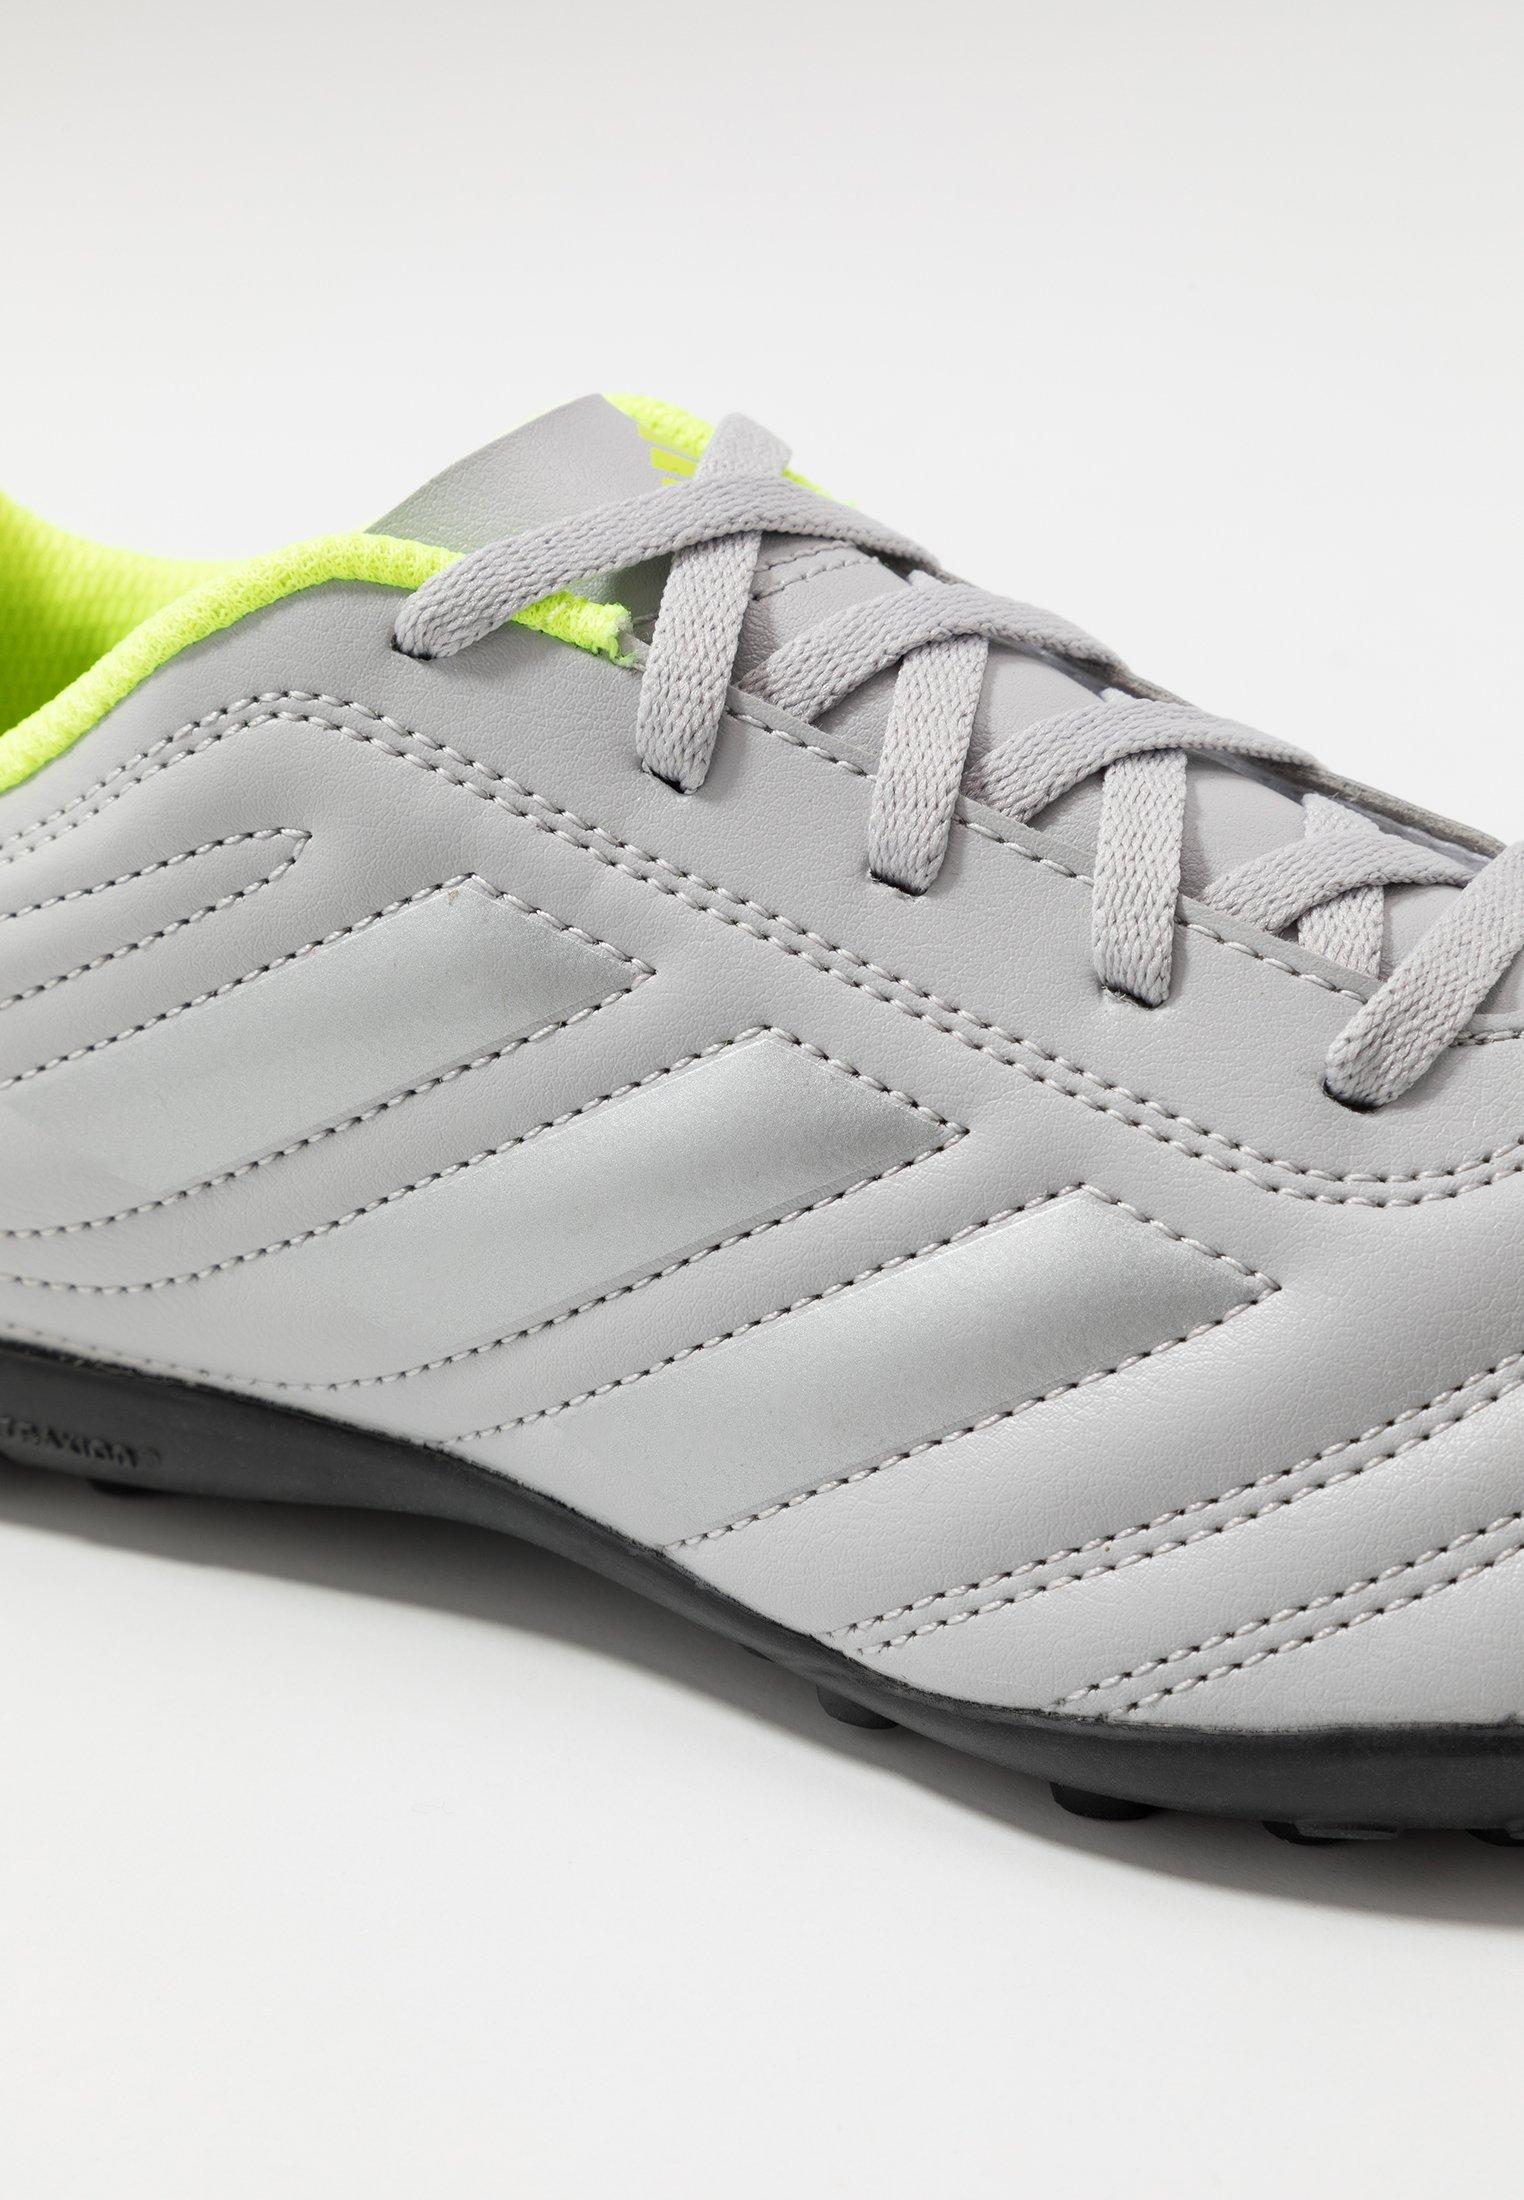 adidas Performance COPA 20.4 TF Fotballsko for kunstgress